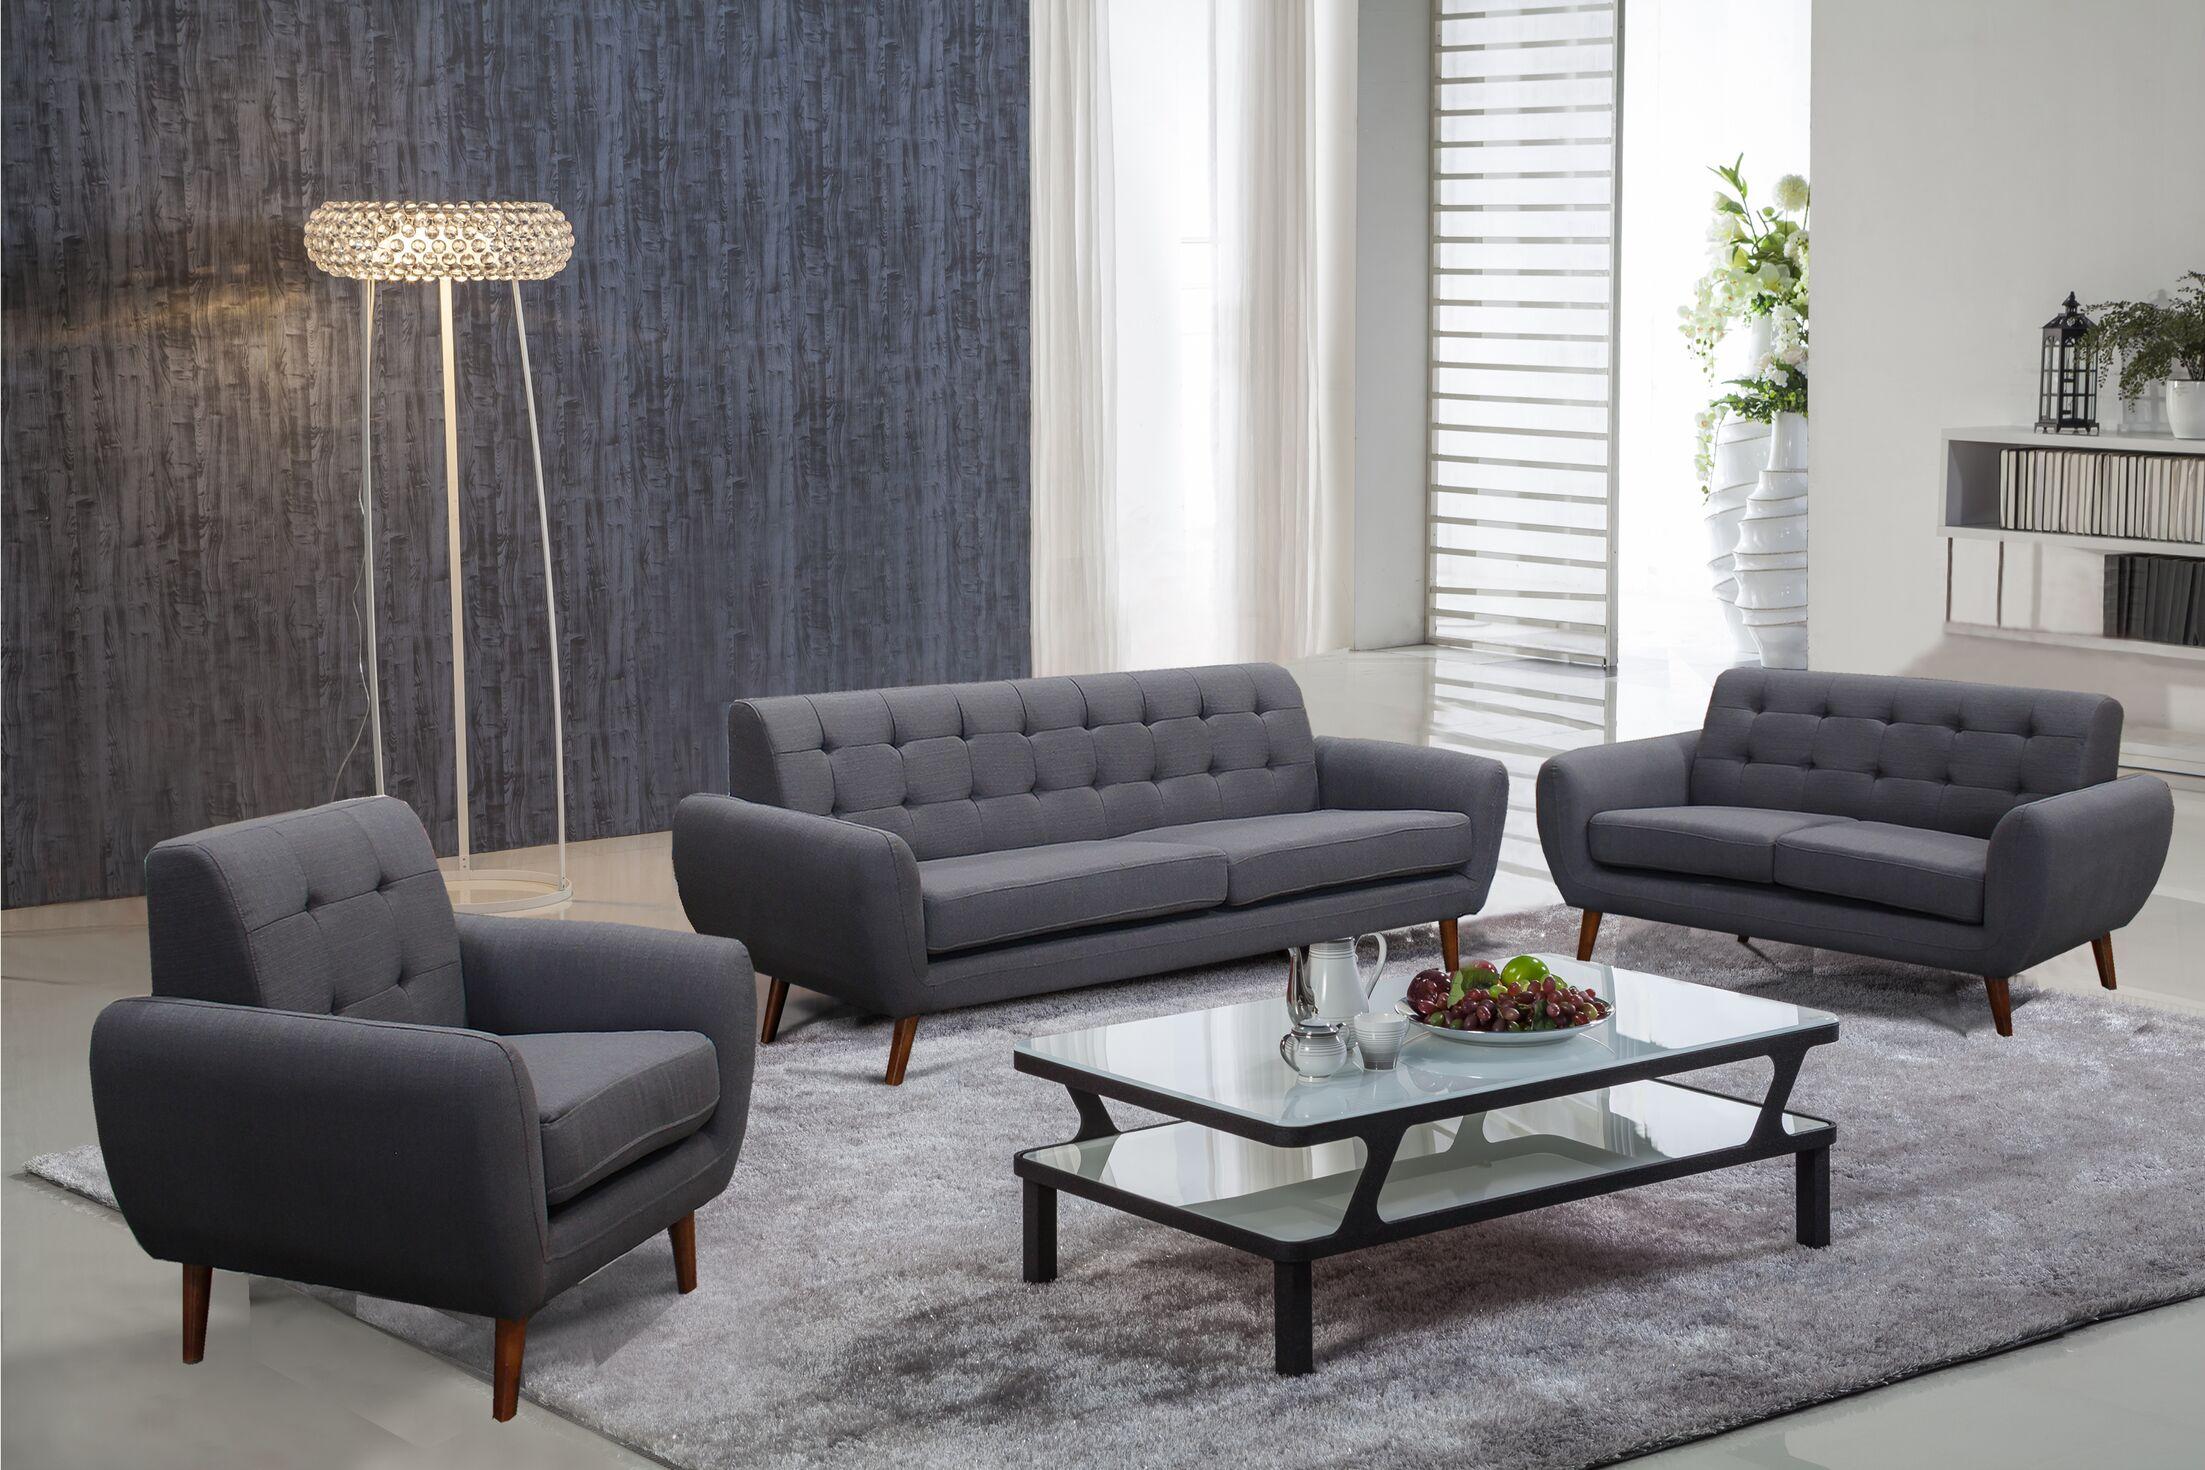 Diara 3 Piece Living Room Set Upholstery: Dark Gray